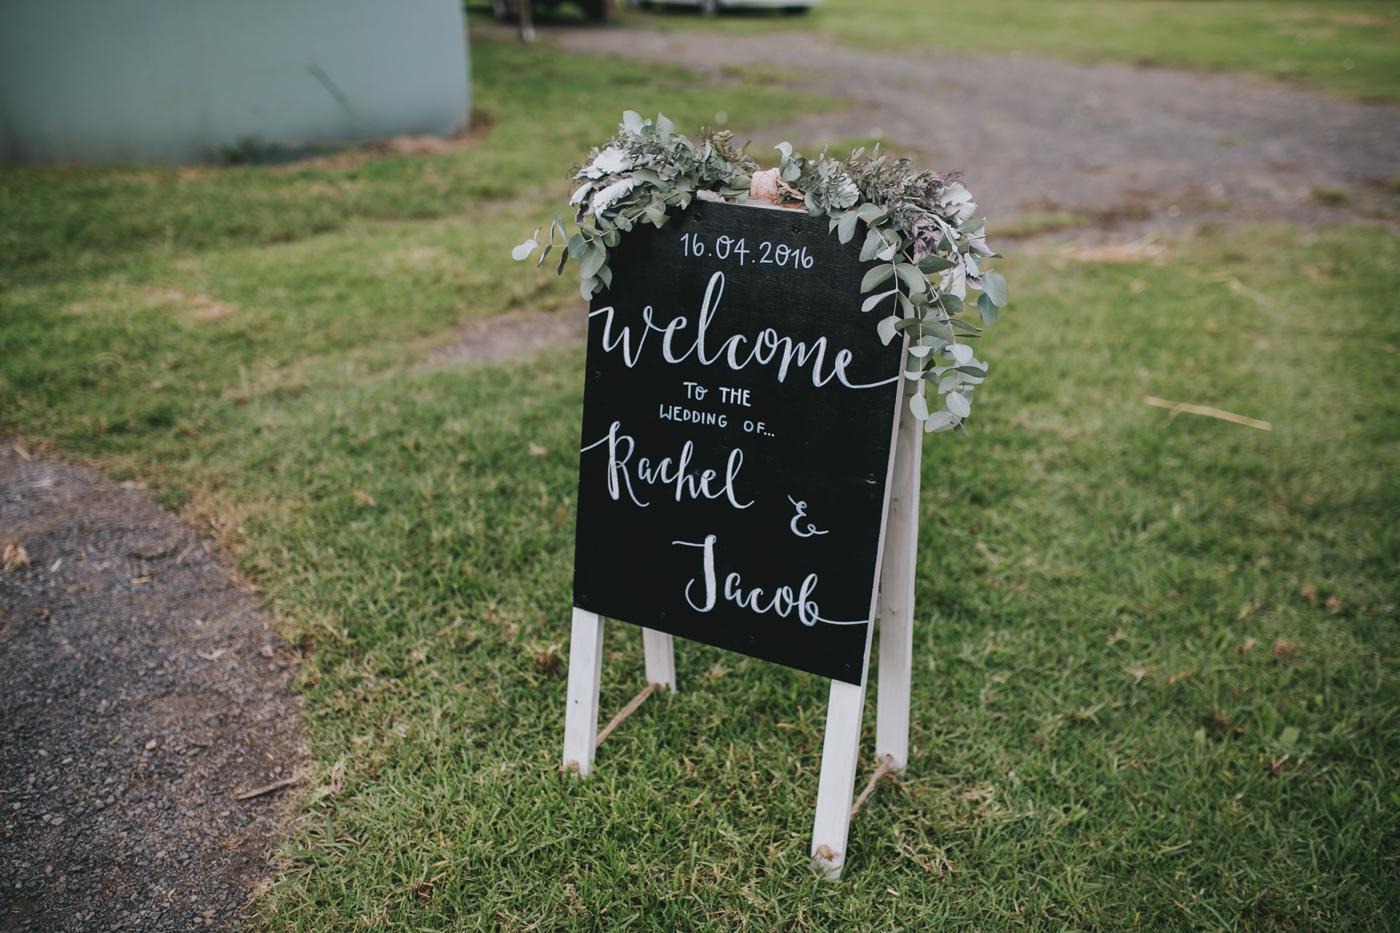 Rachel & Jacob - Willow Farm Berry - South Coast Wedding - Samantha Heather Photography-57.jpg